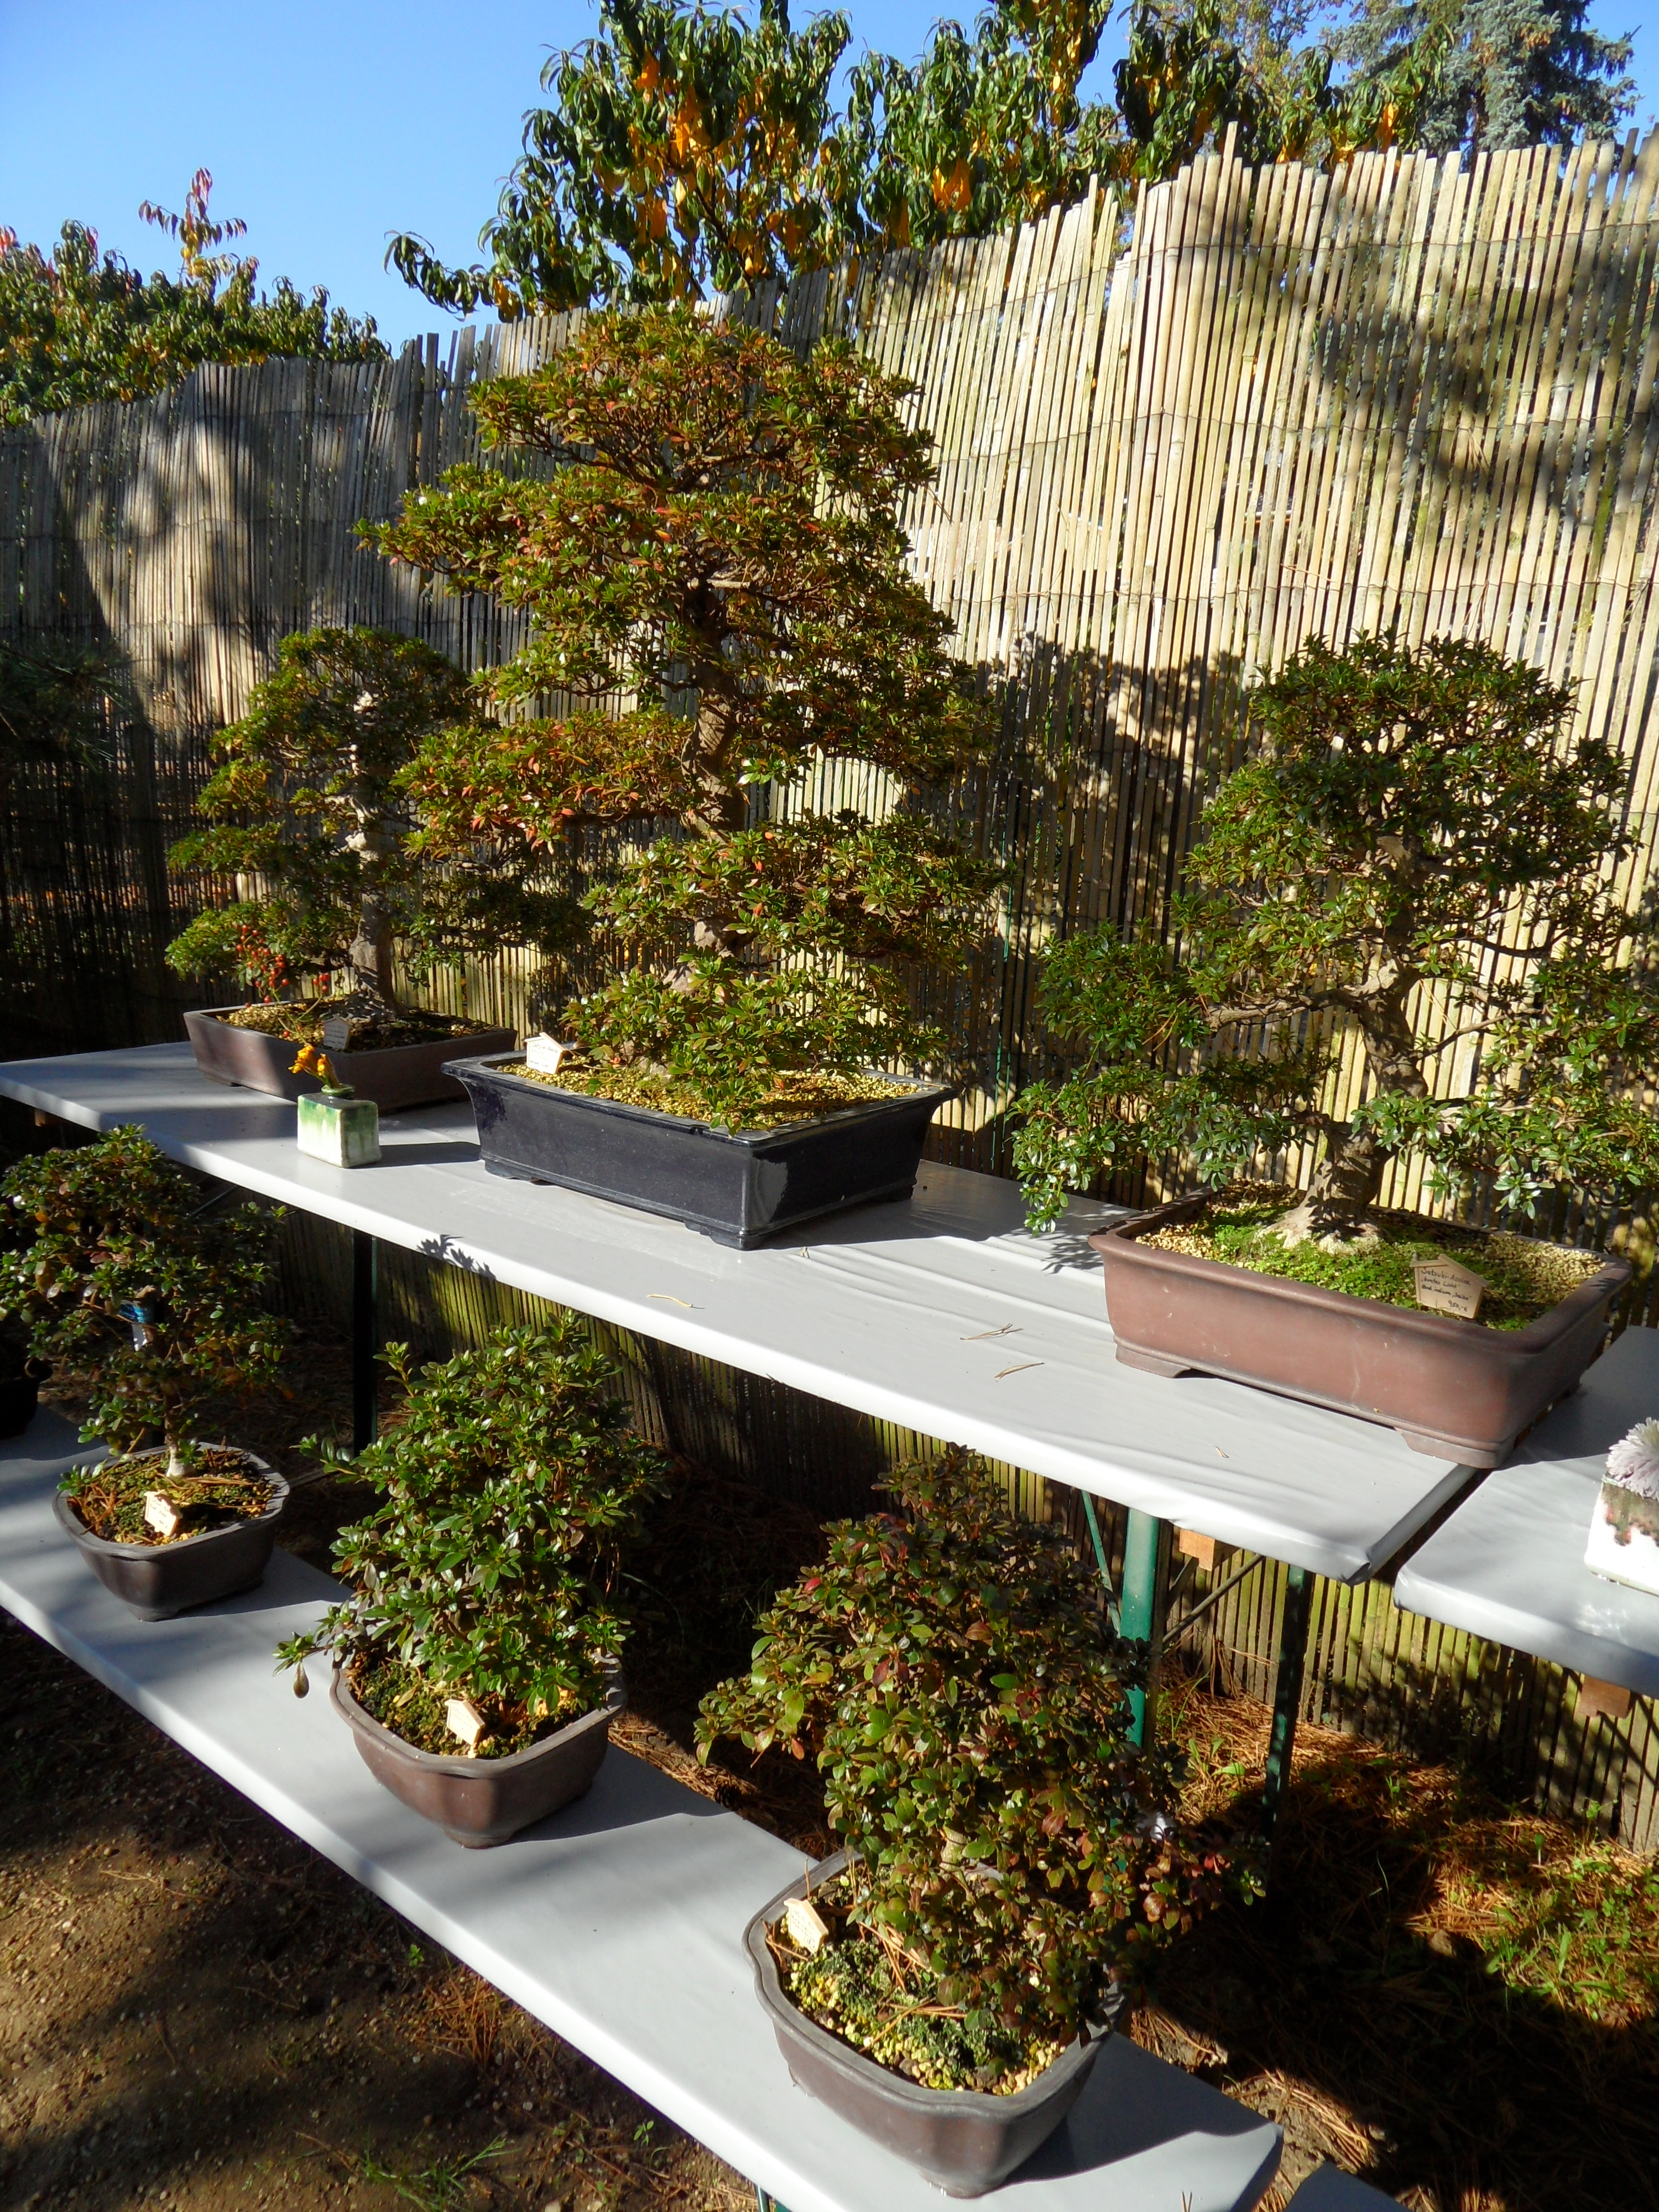 brandenburg hike tour ferch linienwitz wietkiekenberg ferch japanese bonsai garden. Black Bedroom Furniture Sets. Home Design Ideas